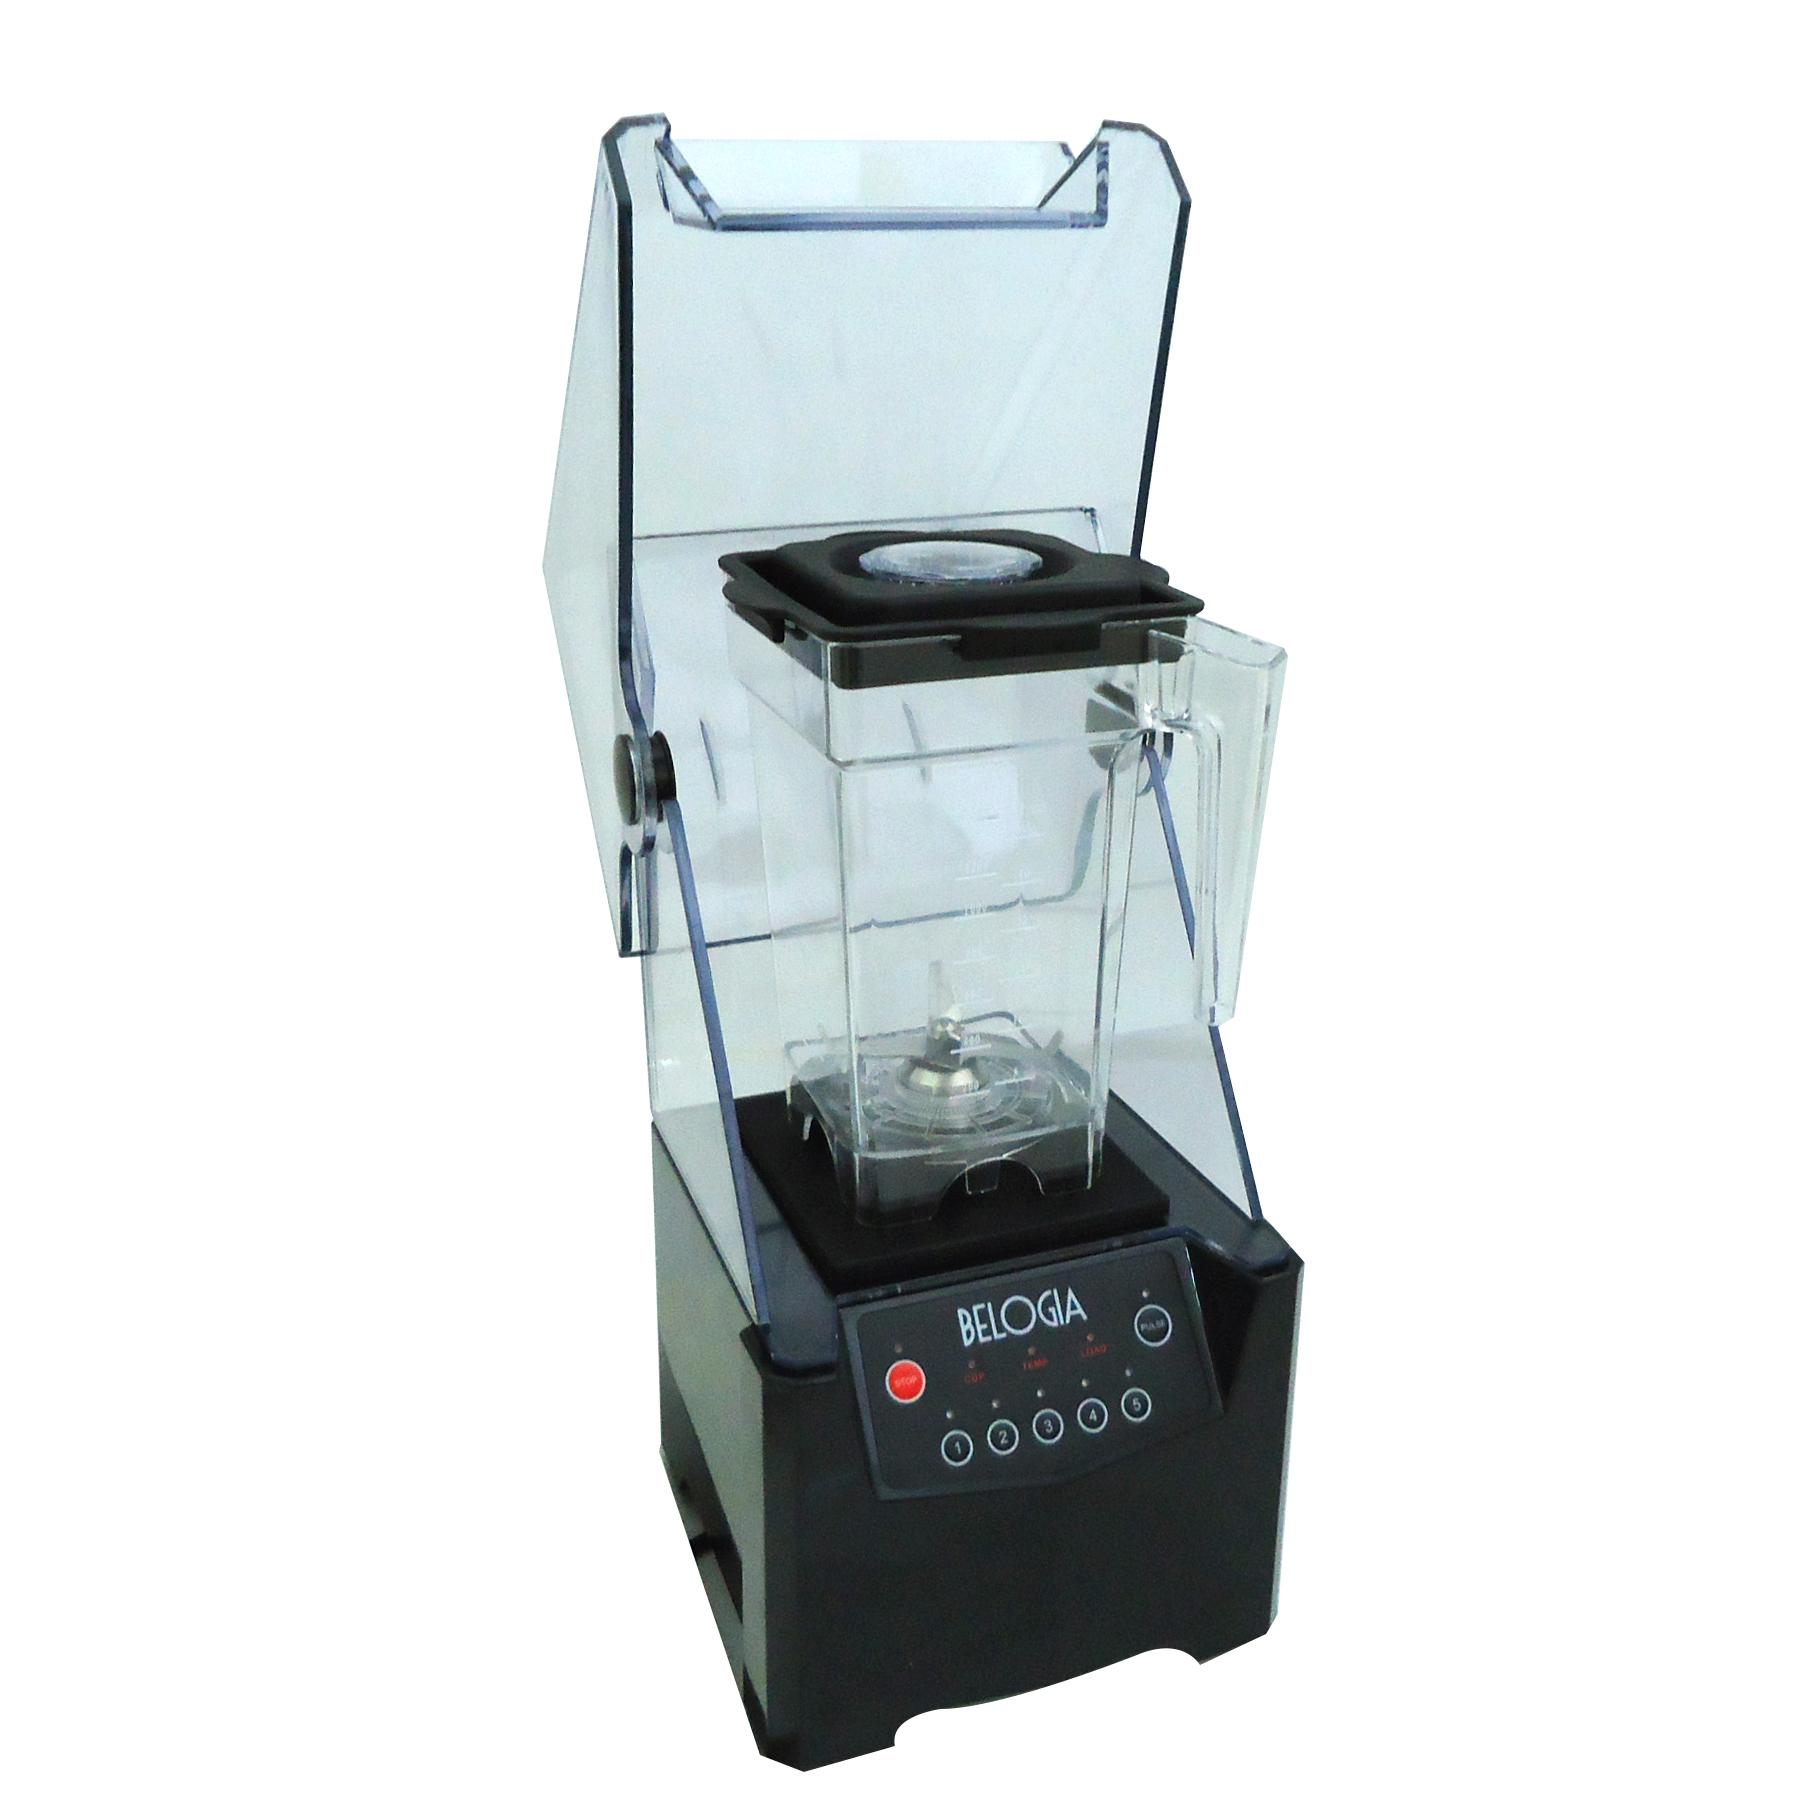 BELOGIA BL-6MC Μπλέντερ Επαγγελματικό 1,5Lit Με Κάλυμμα Ασφαλείας - 800Watt επαγγελματικός εξοπλισμός   μηχανές καφέ   συσκευές για bar  επαγγελματικός εξοπ